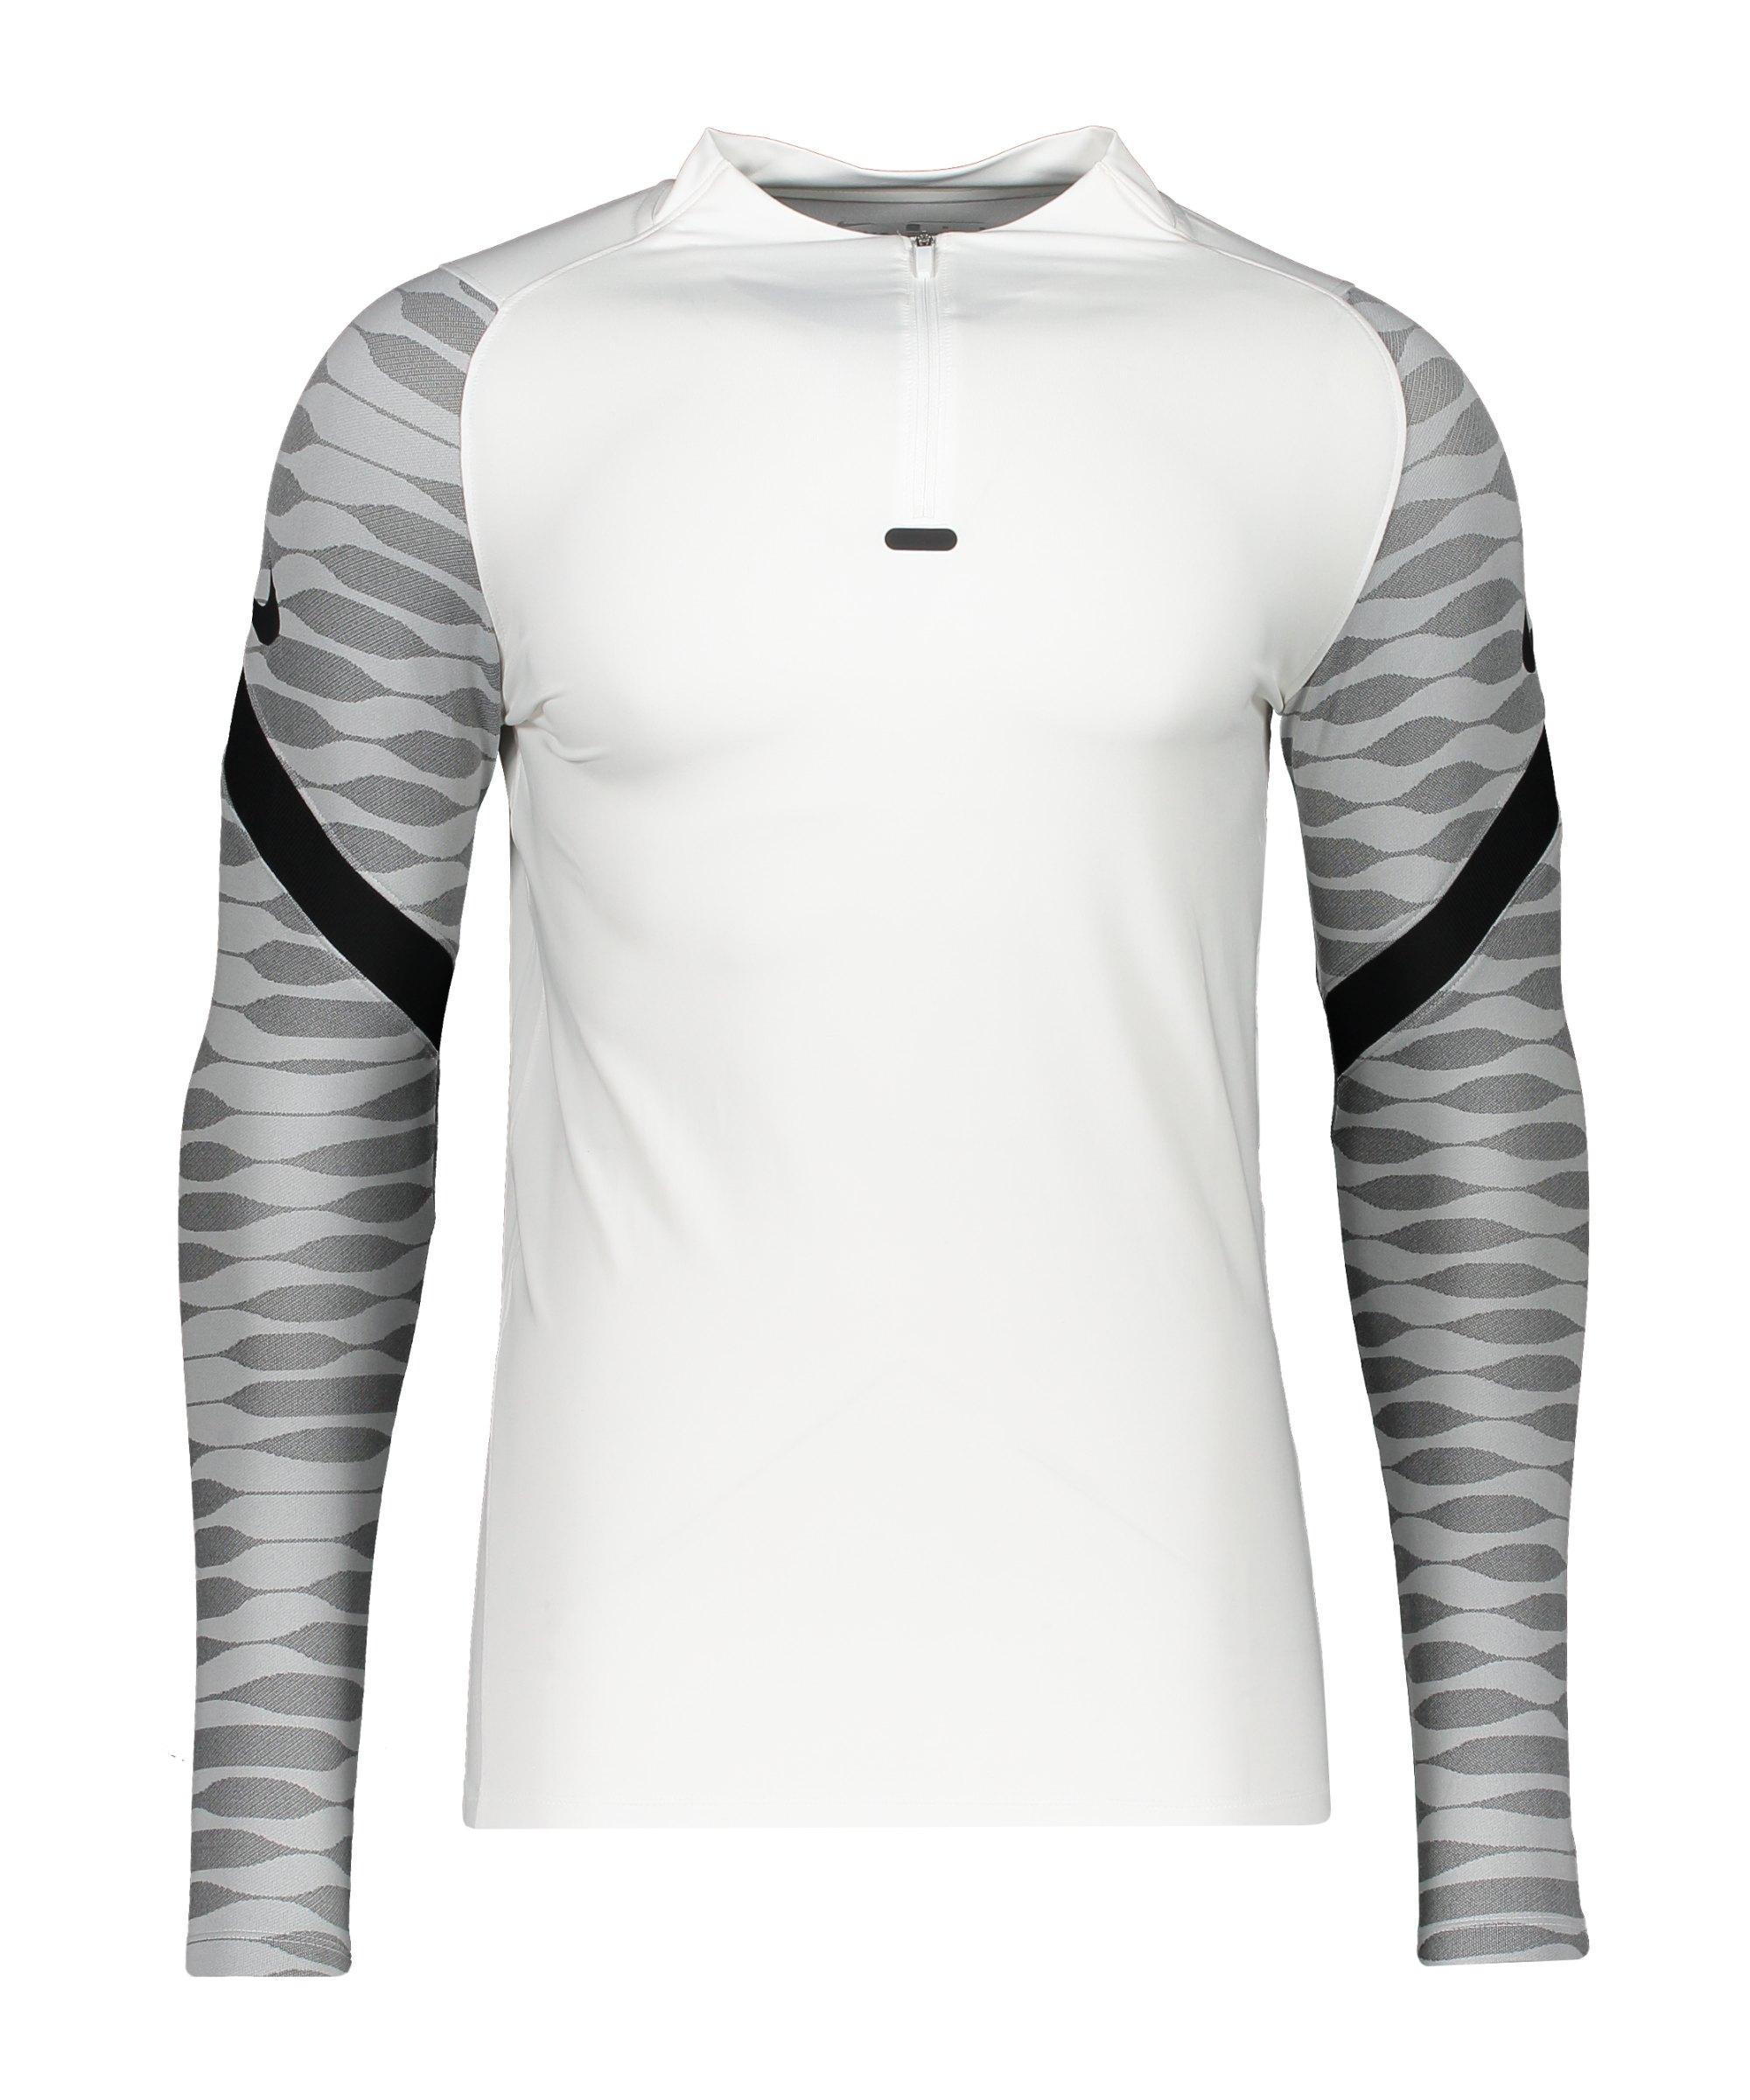 Nike Strike 21 Drill Top Weiss Schwarz F100 - weiss